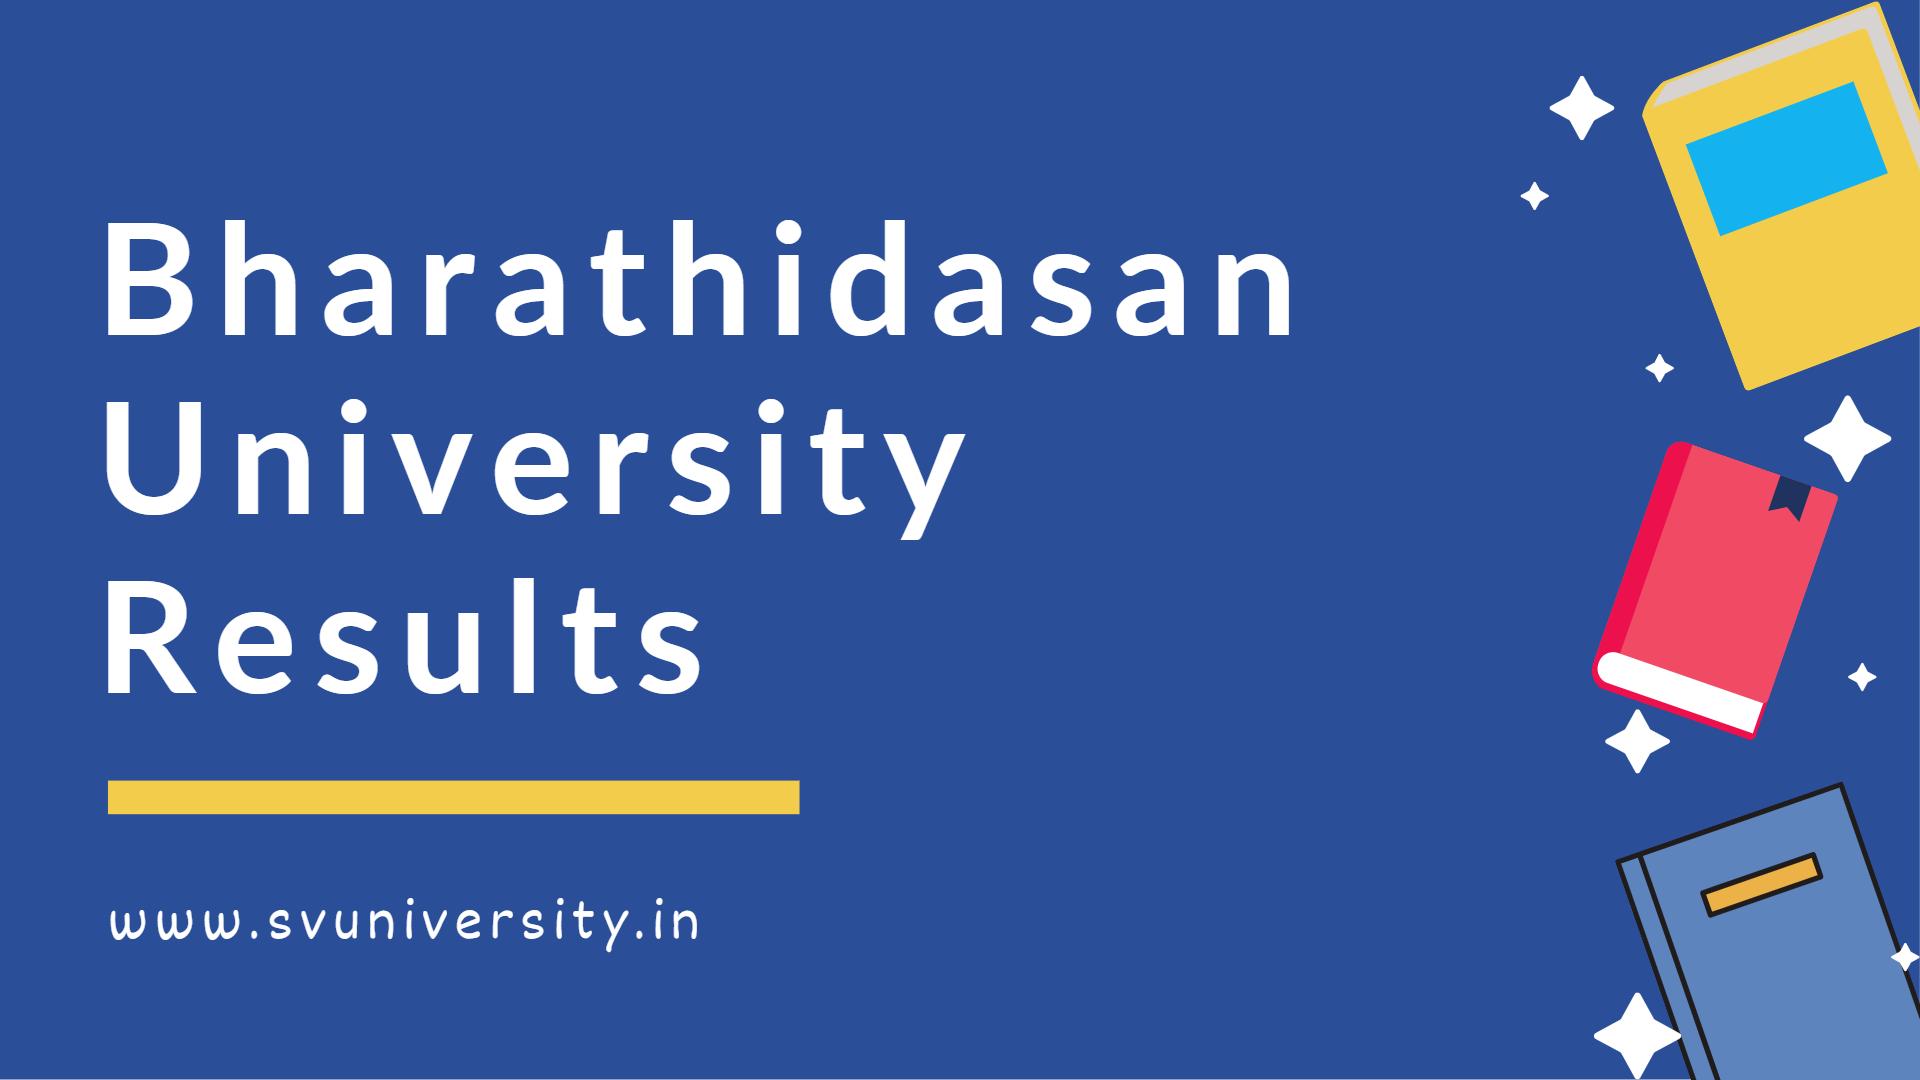 Bharathidasan University Results 2021